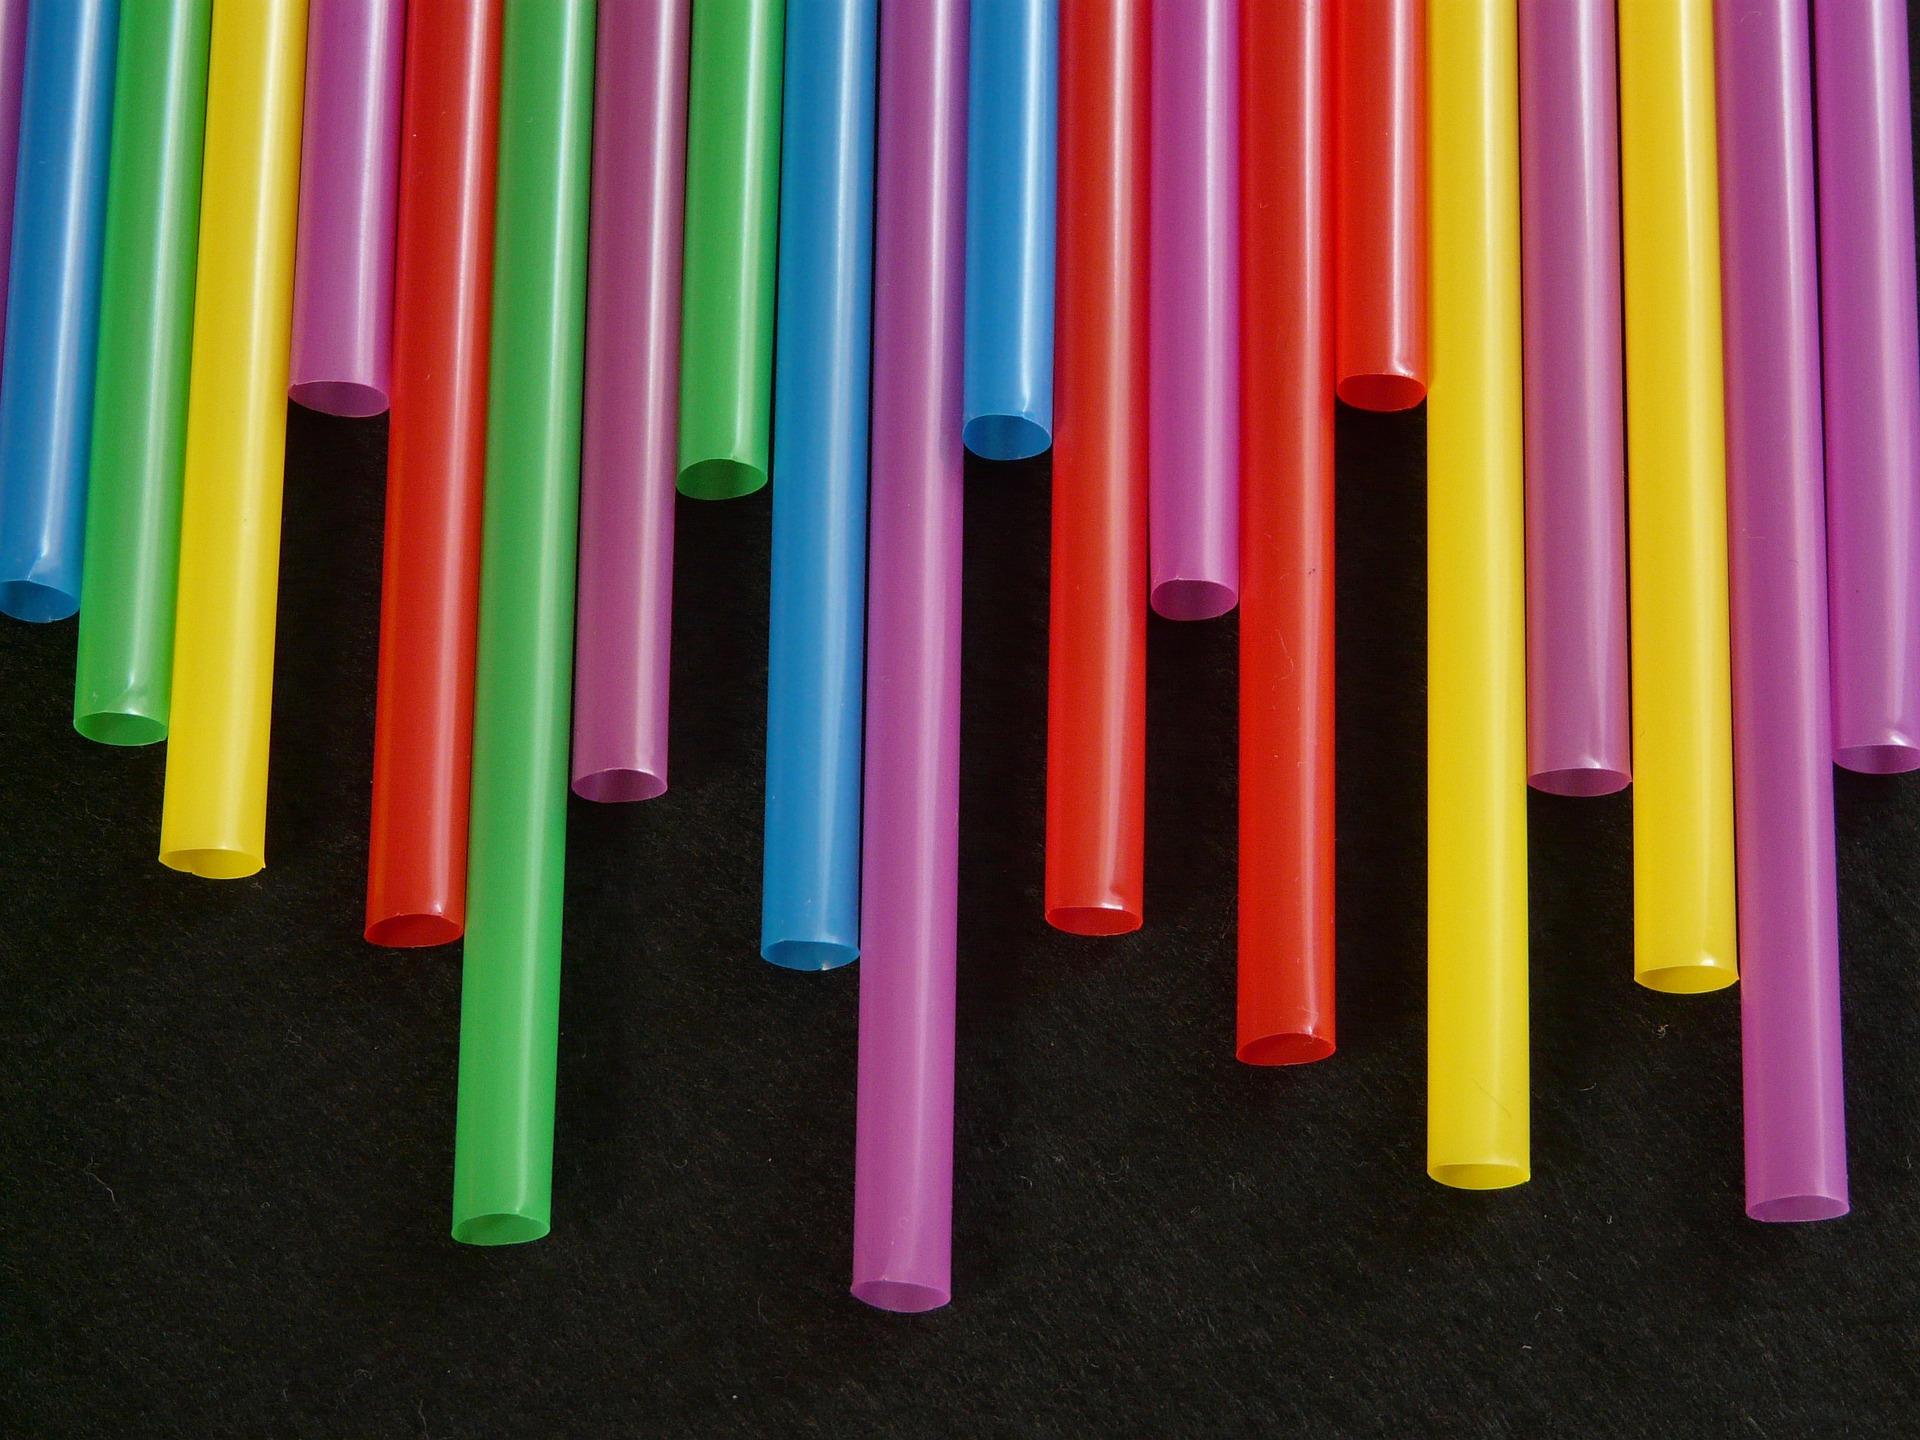 Straws-8001_1920_small